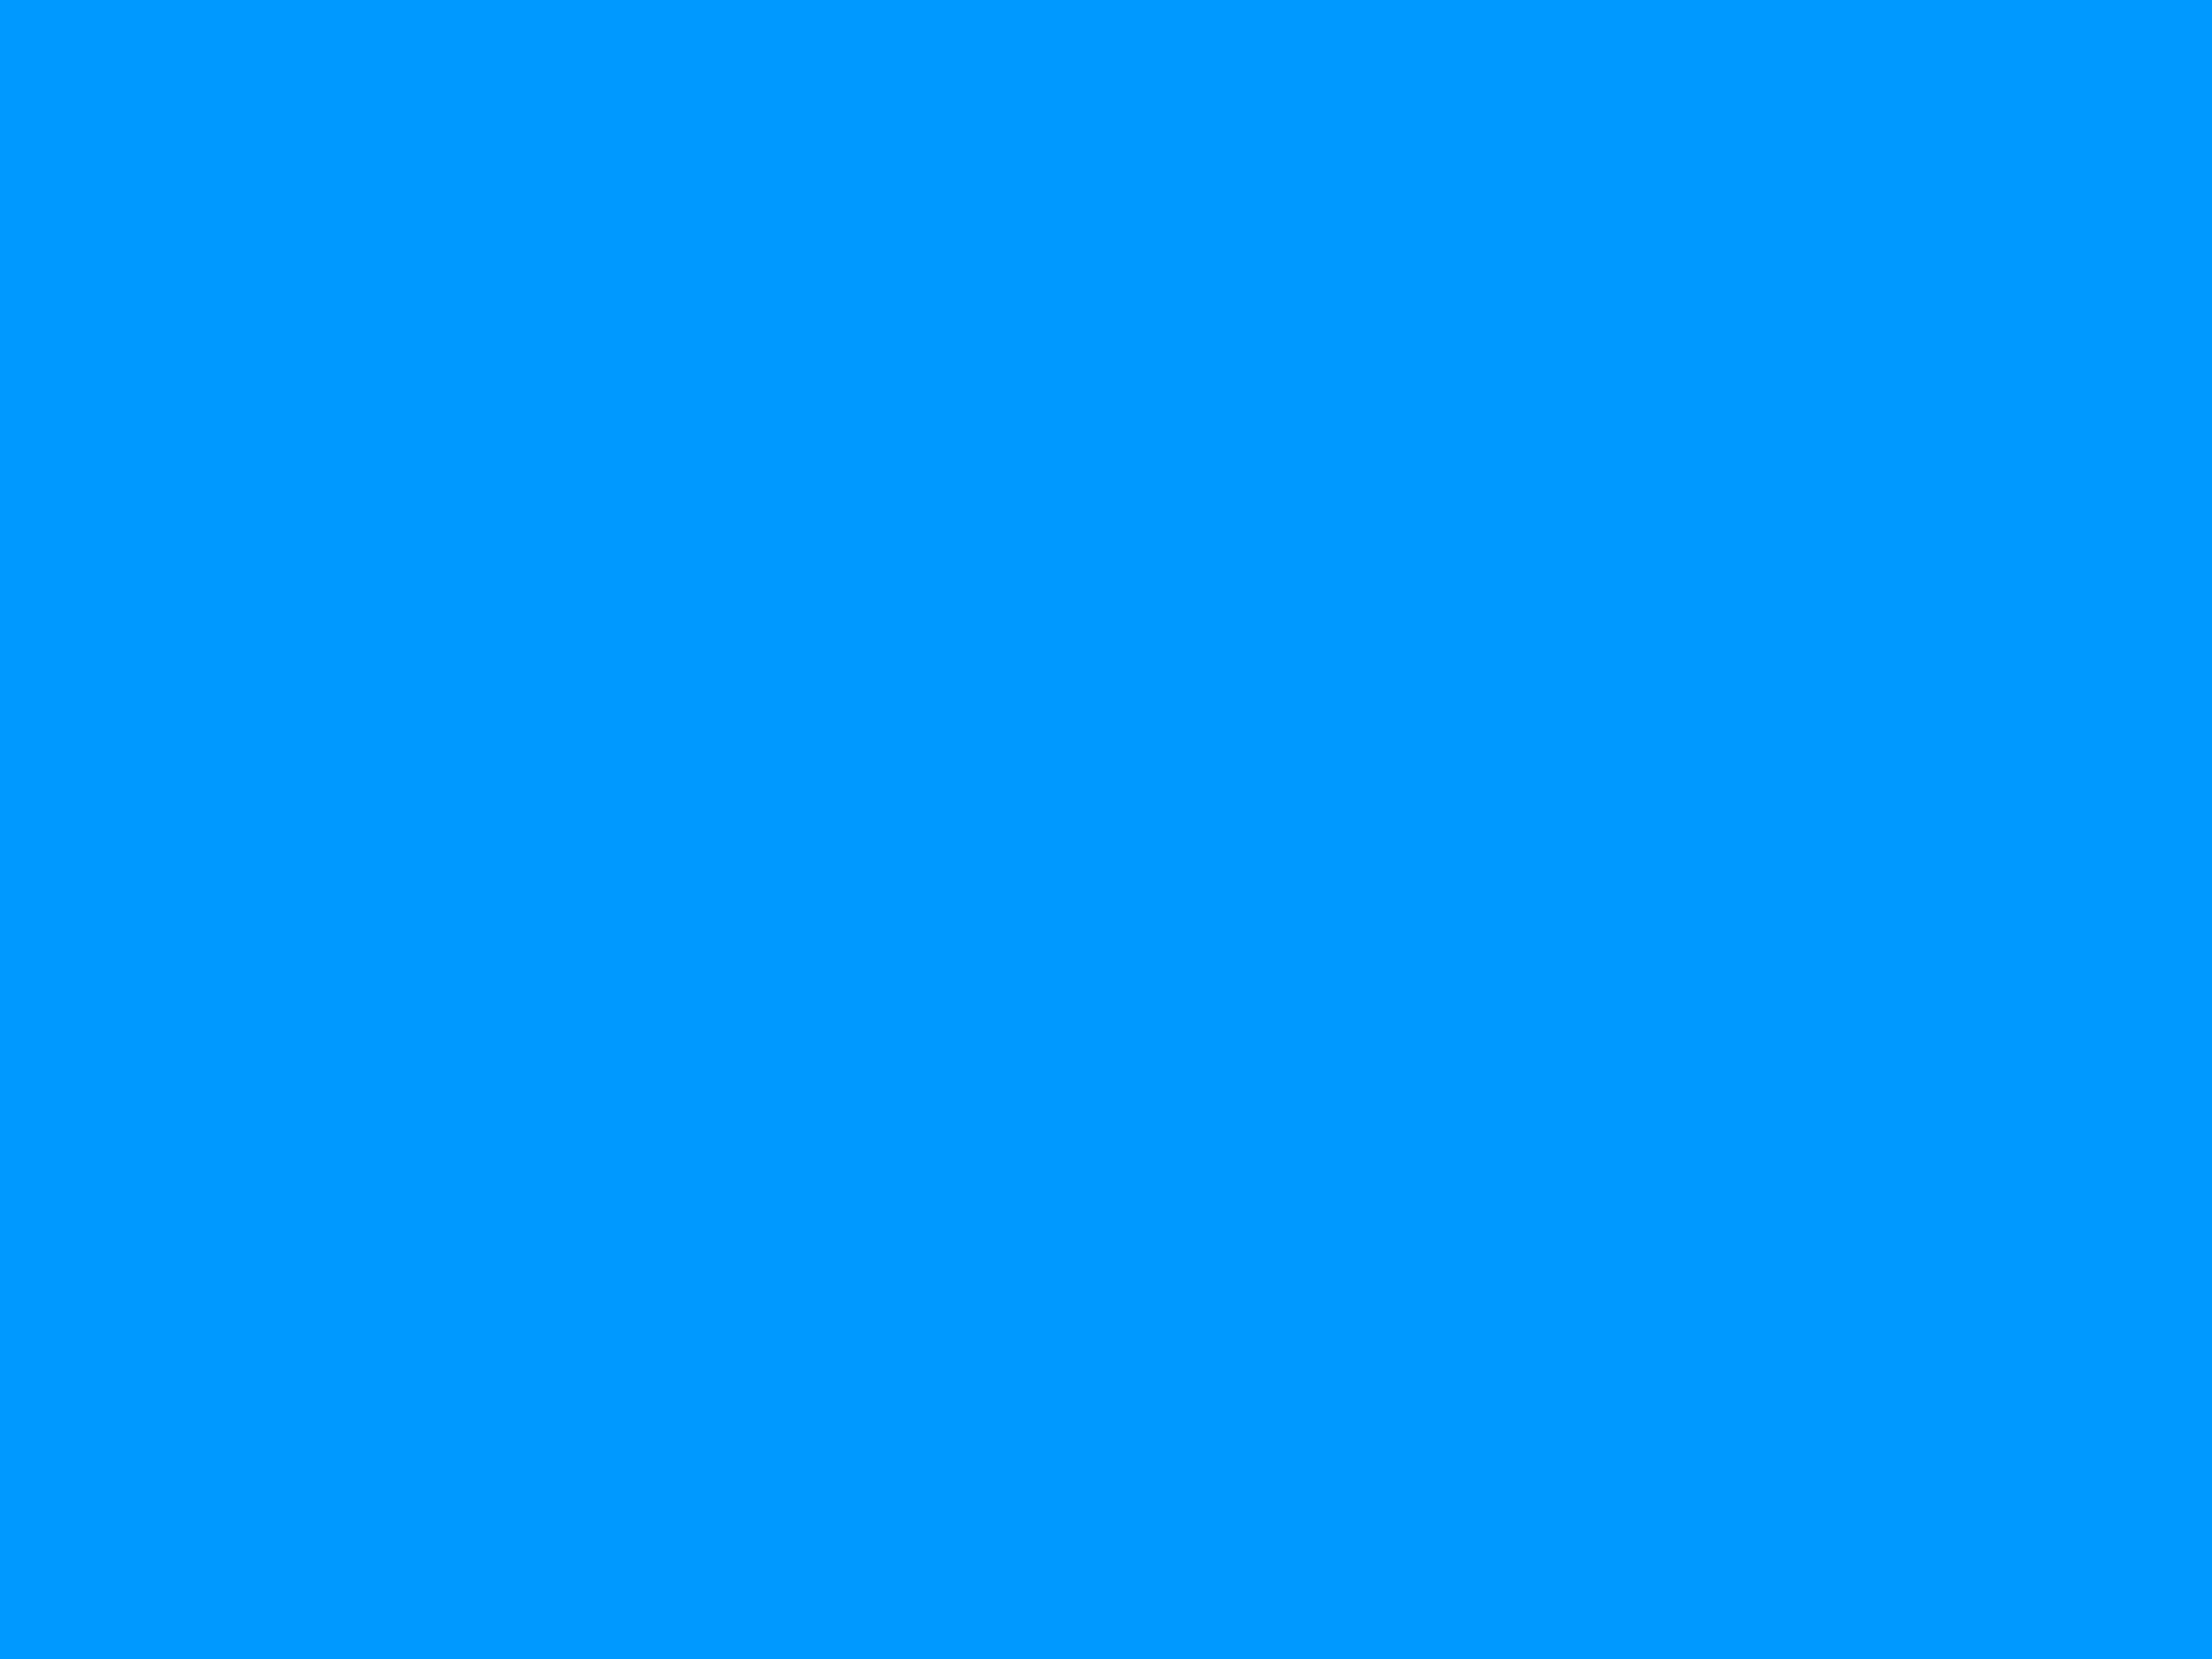 Hellblau (Farbe)